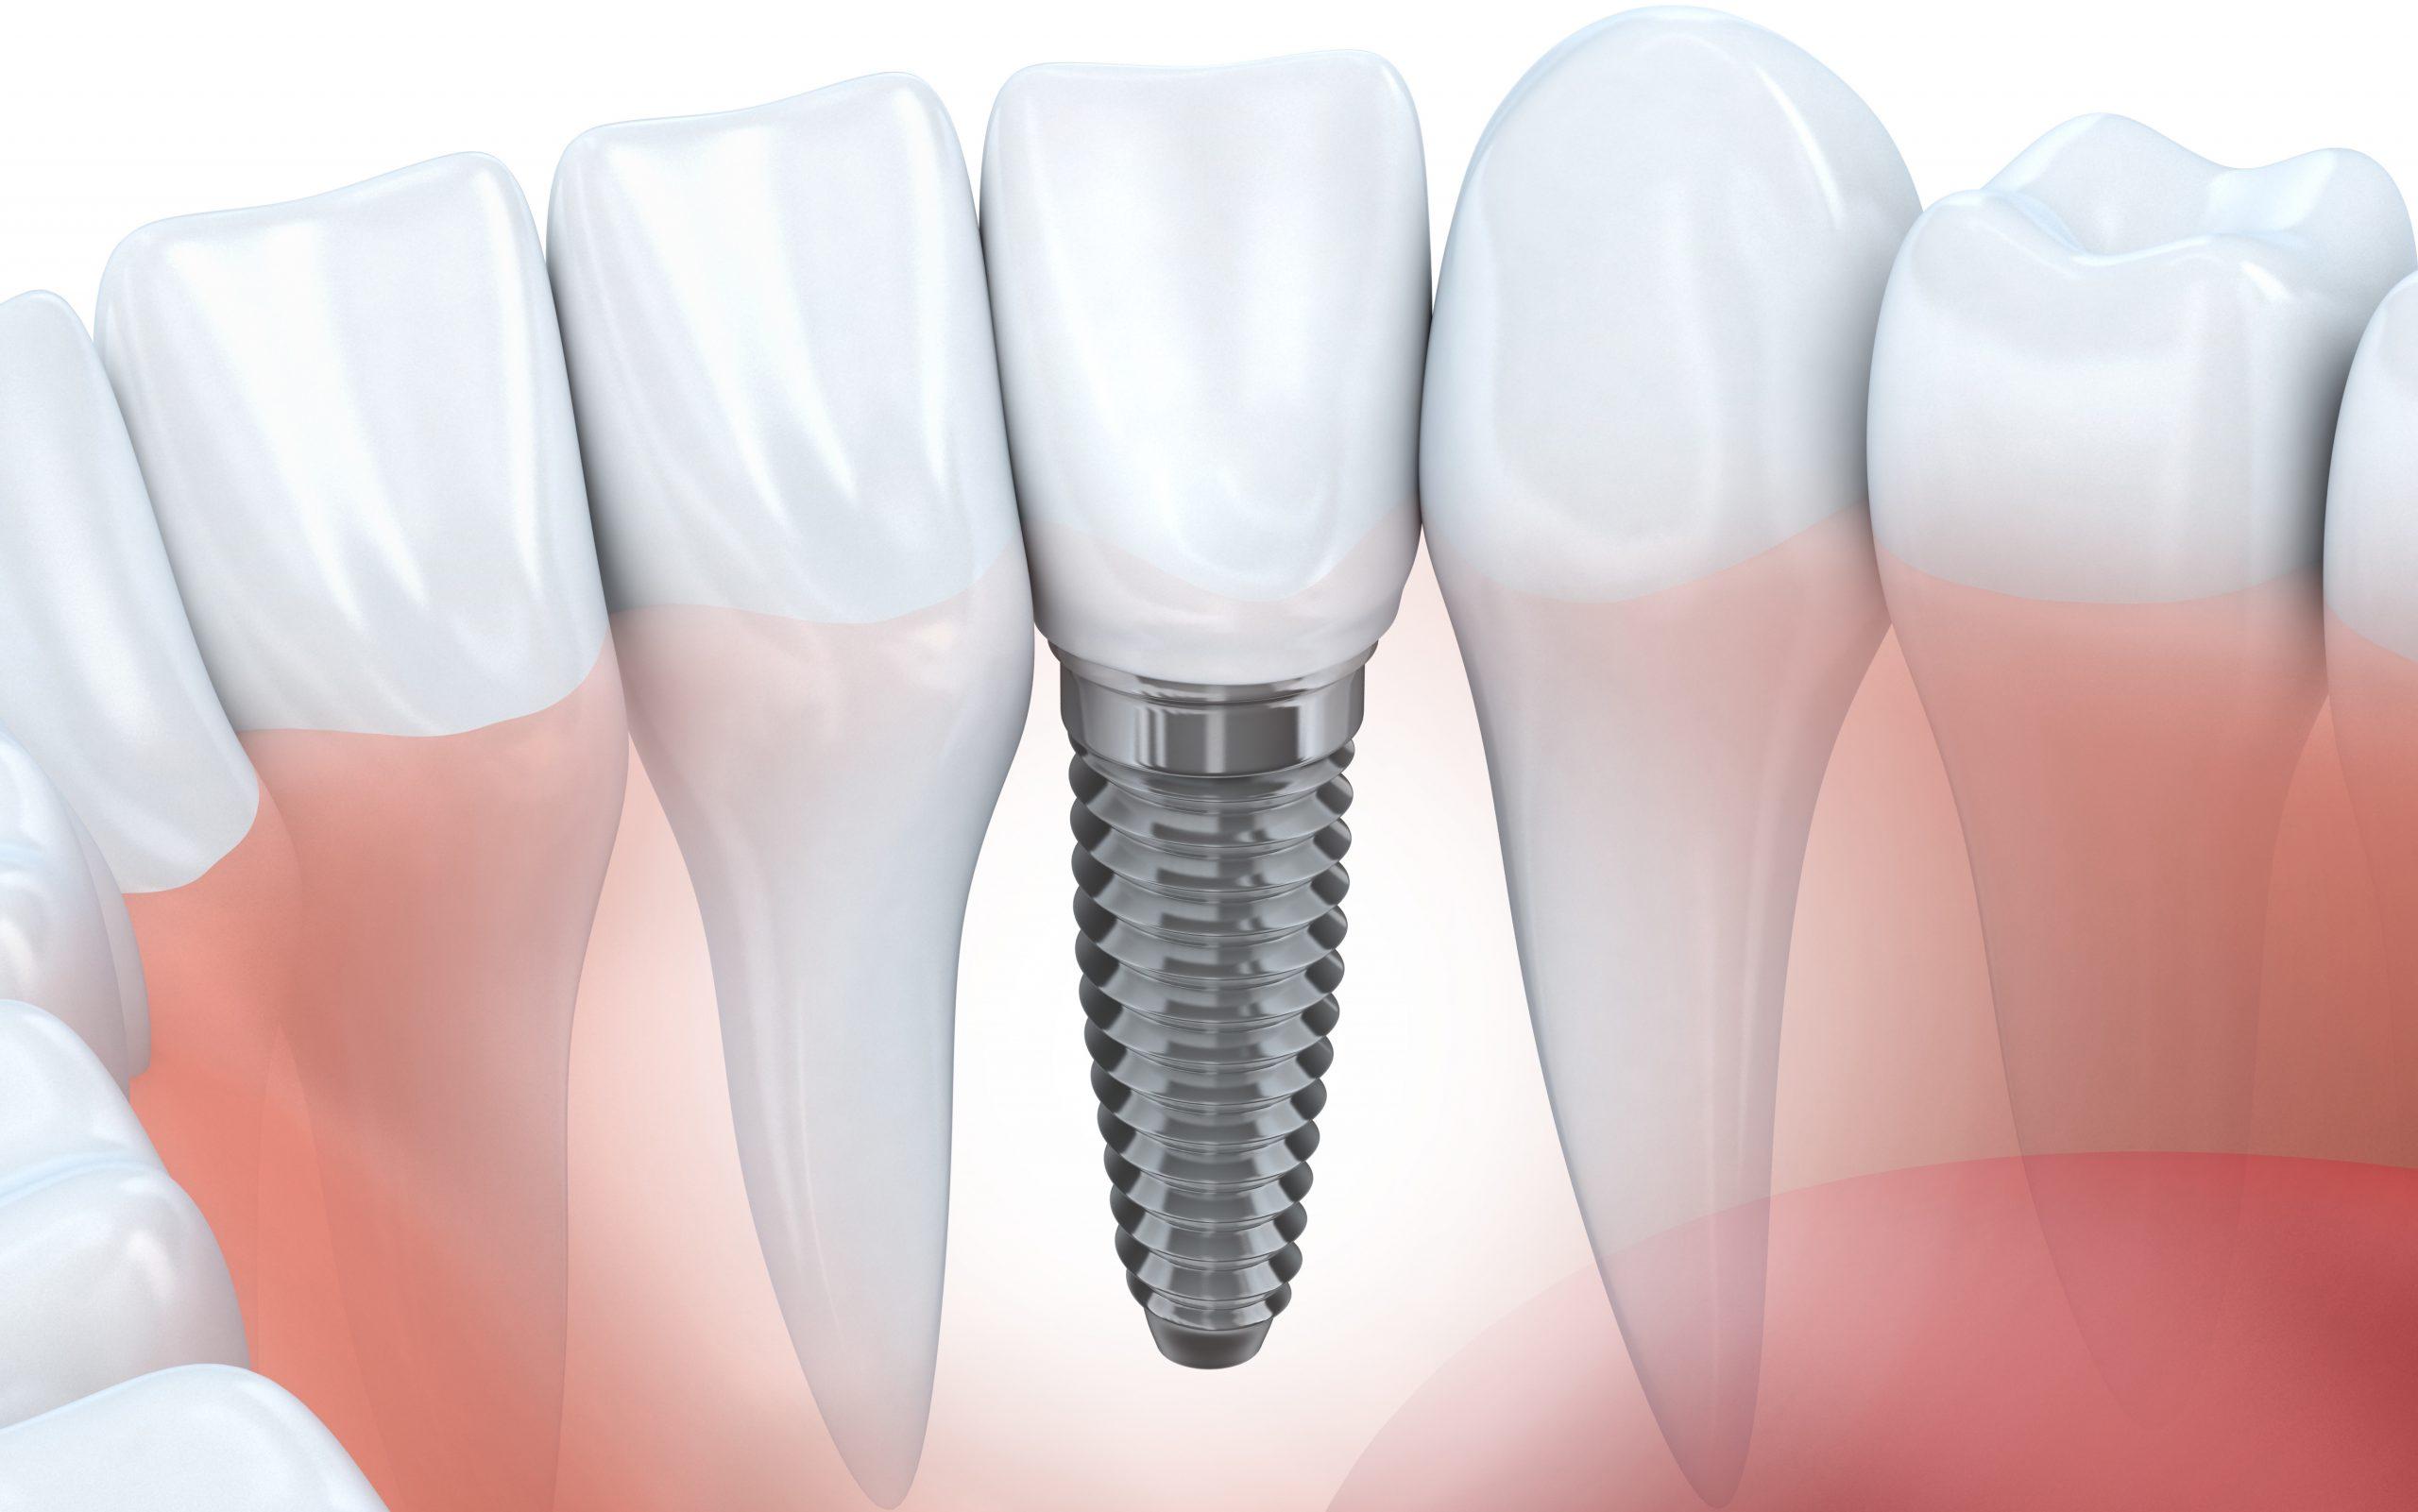 Tandimplantat privat tandläkare uppsala